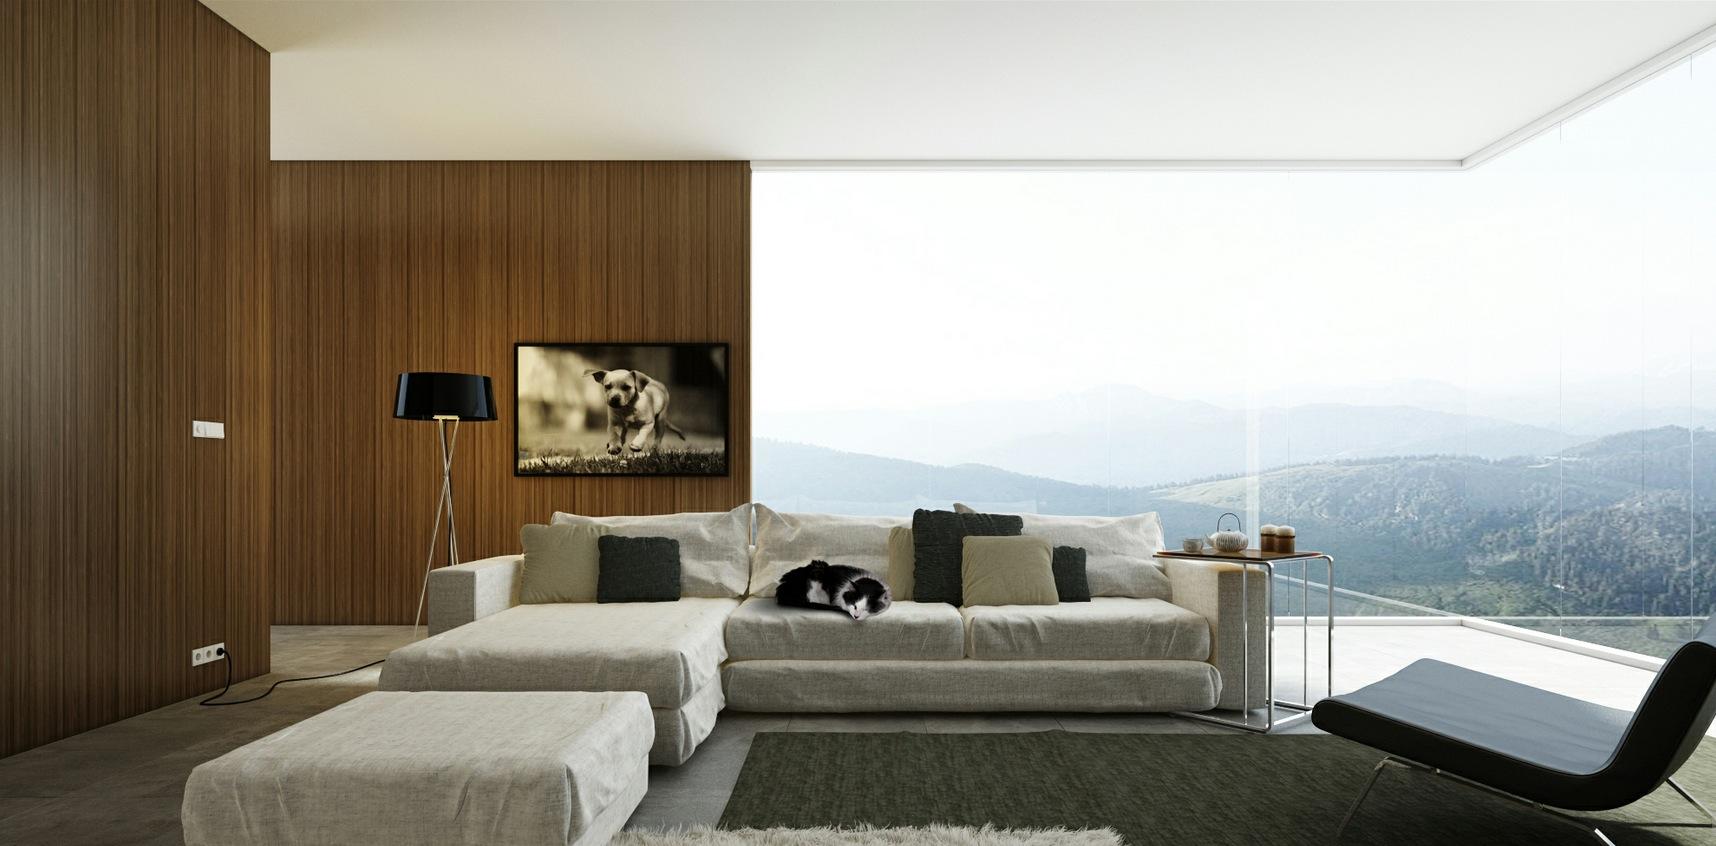 Chaise Lounge Sofa Grey